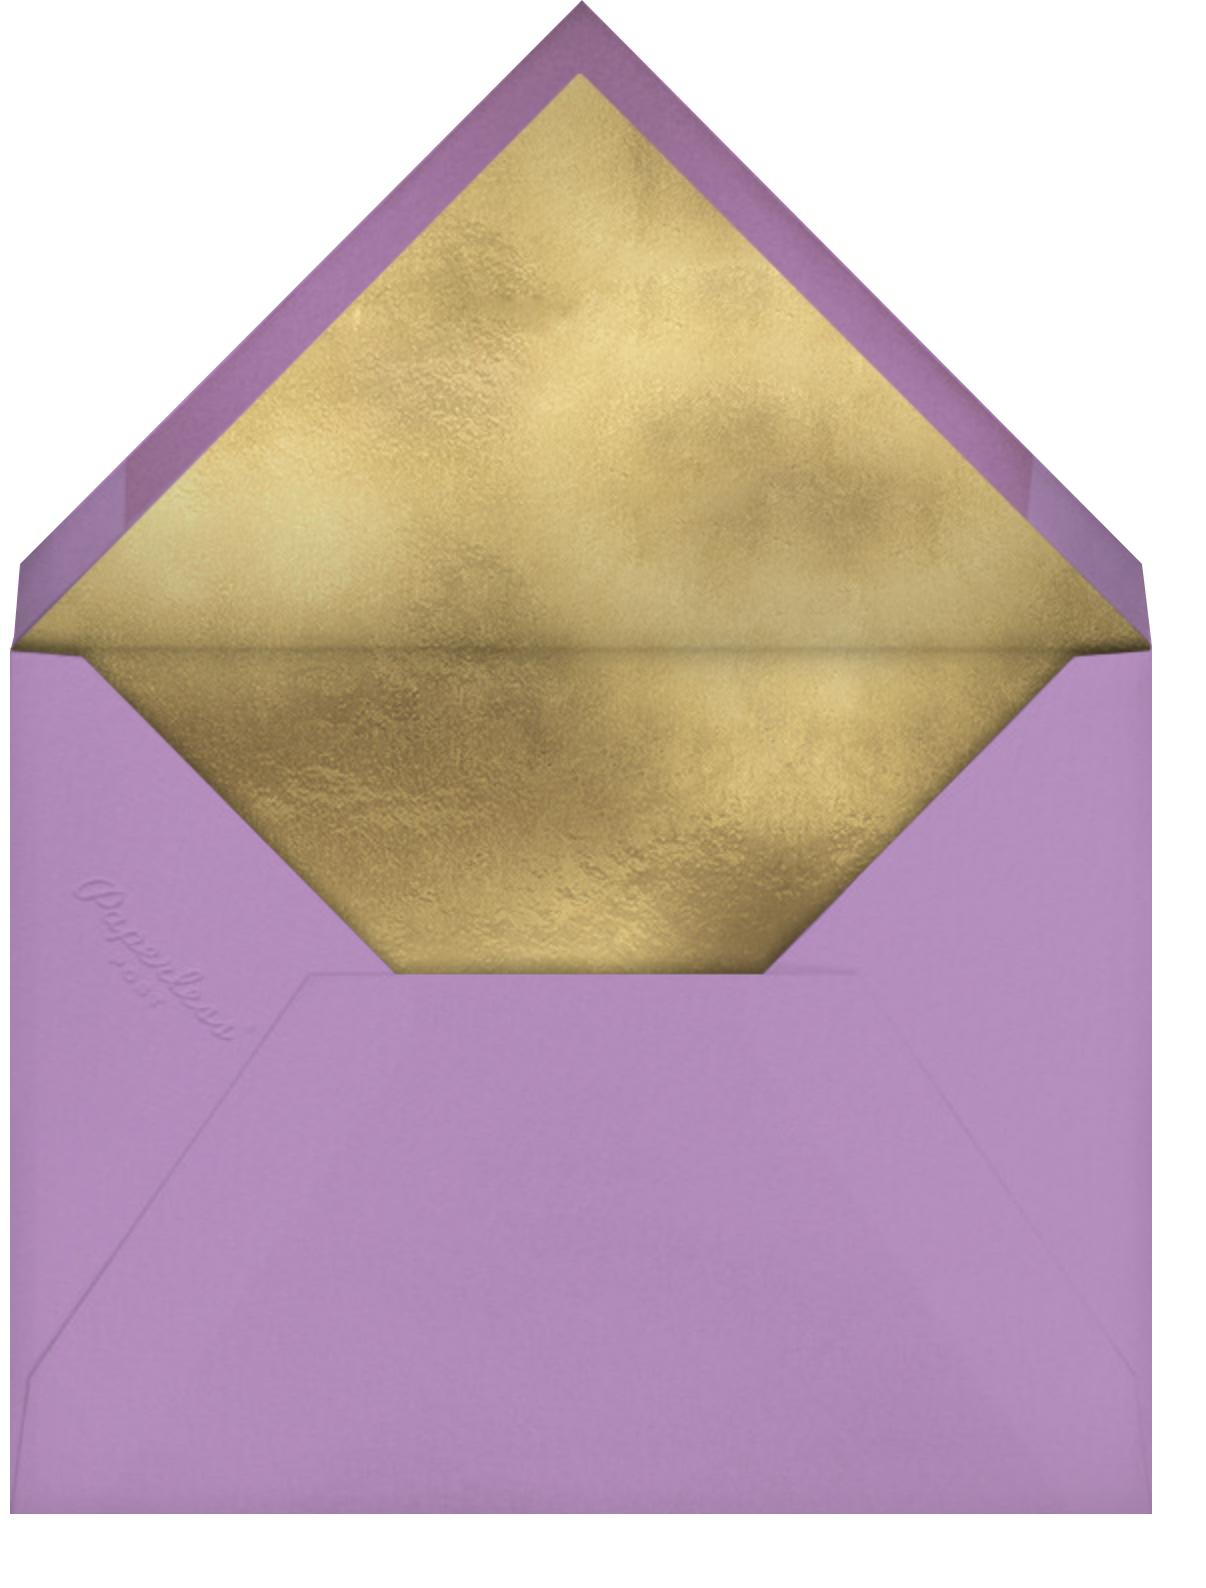 Year of the Sparkler - Gold/Black - Paperless Post - Envelope